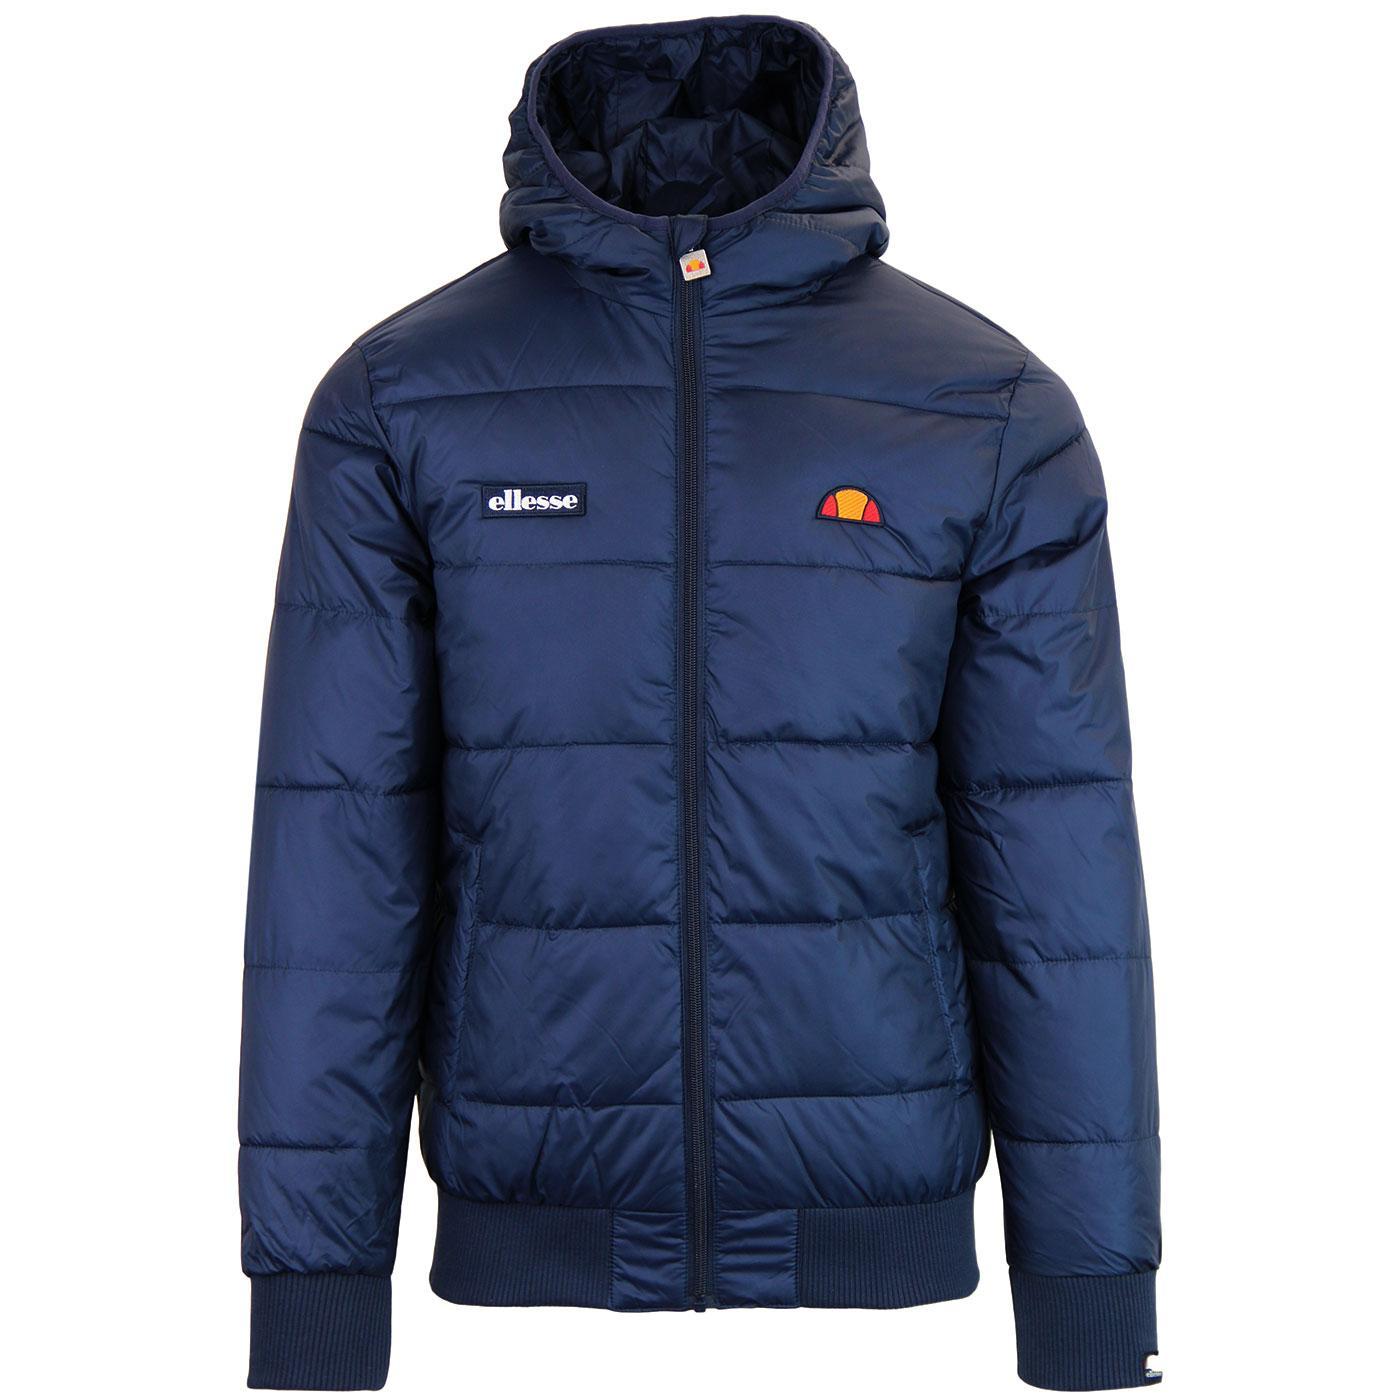 Corvara ELLESSE Retro 70's Quilted Ski Jacket DB